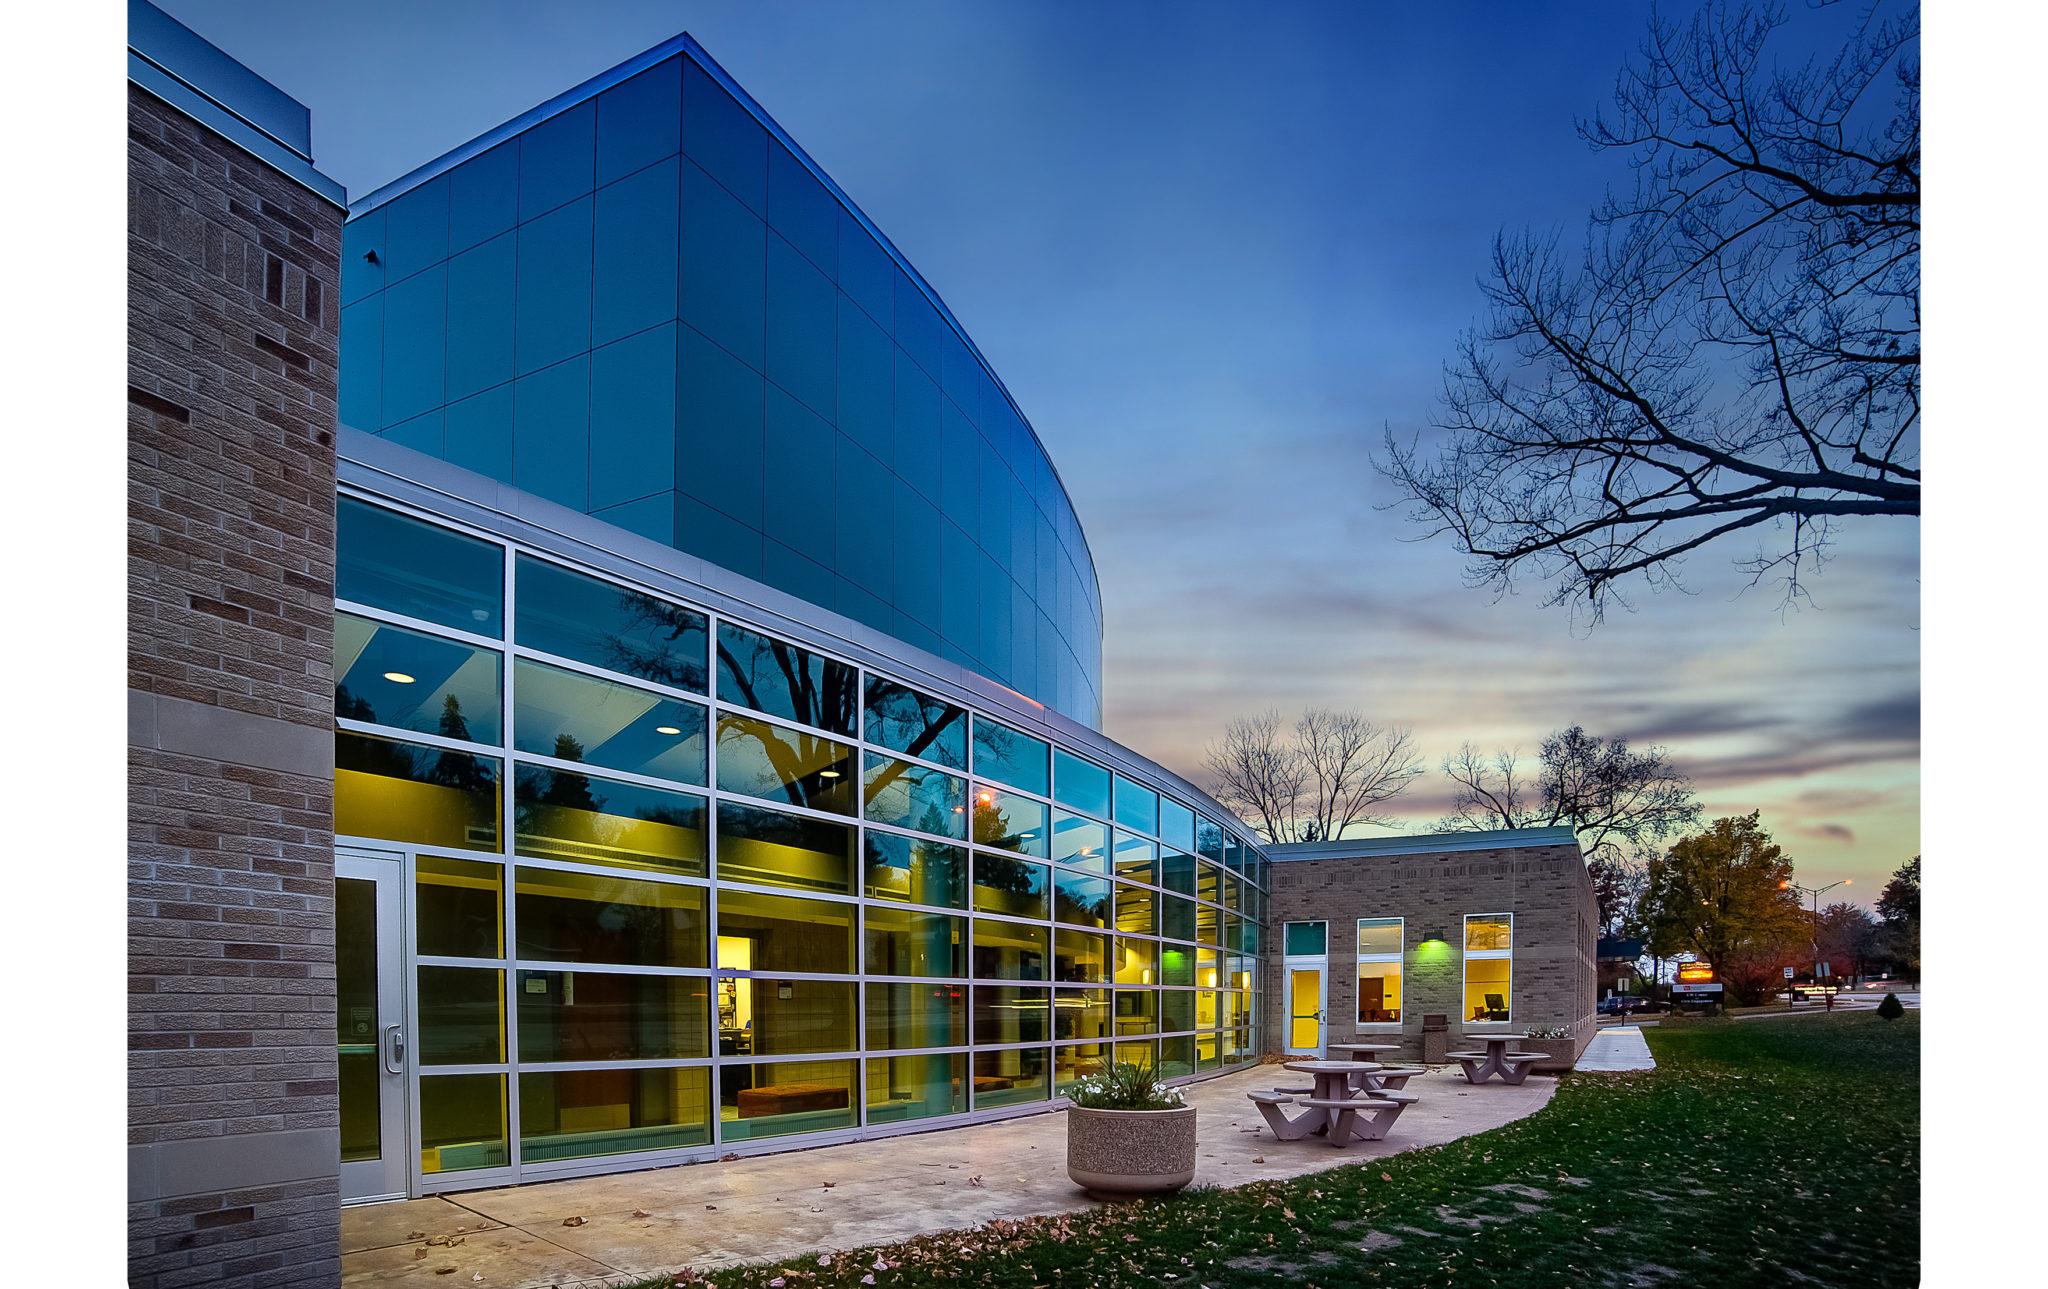 9_UWMC Center for Civic Engagement